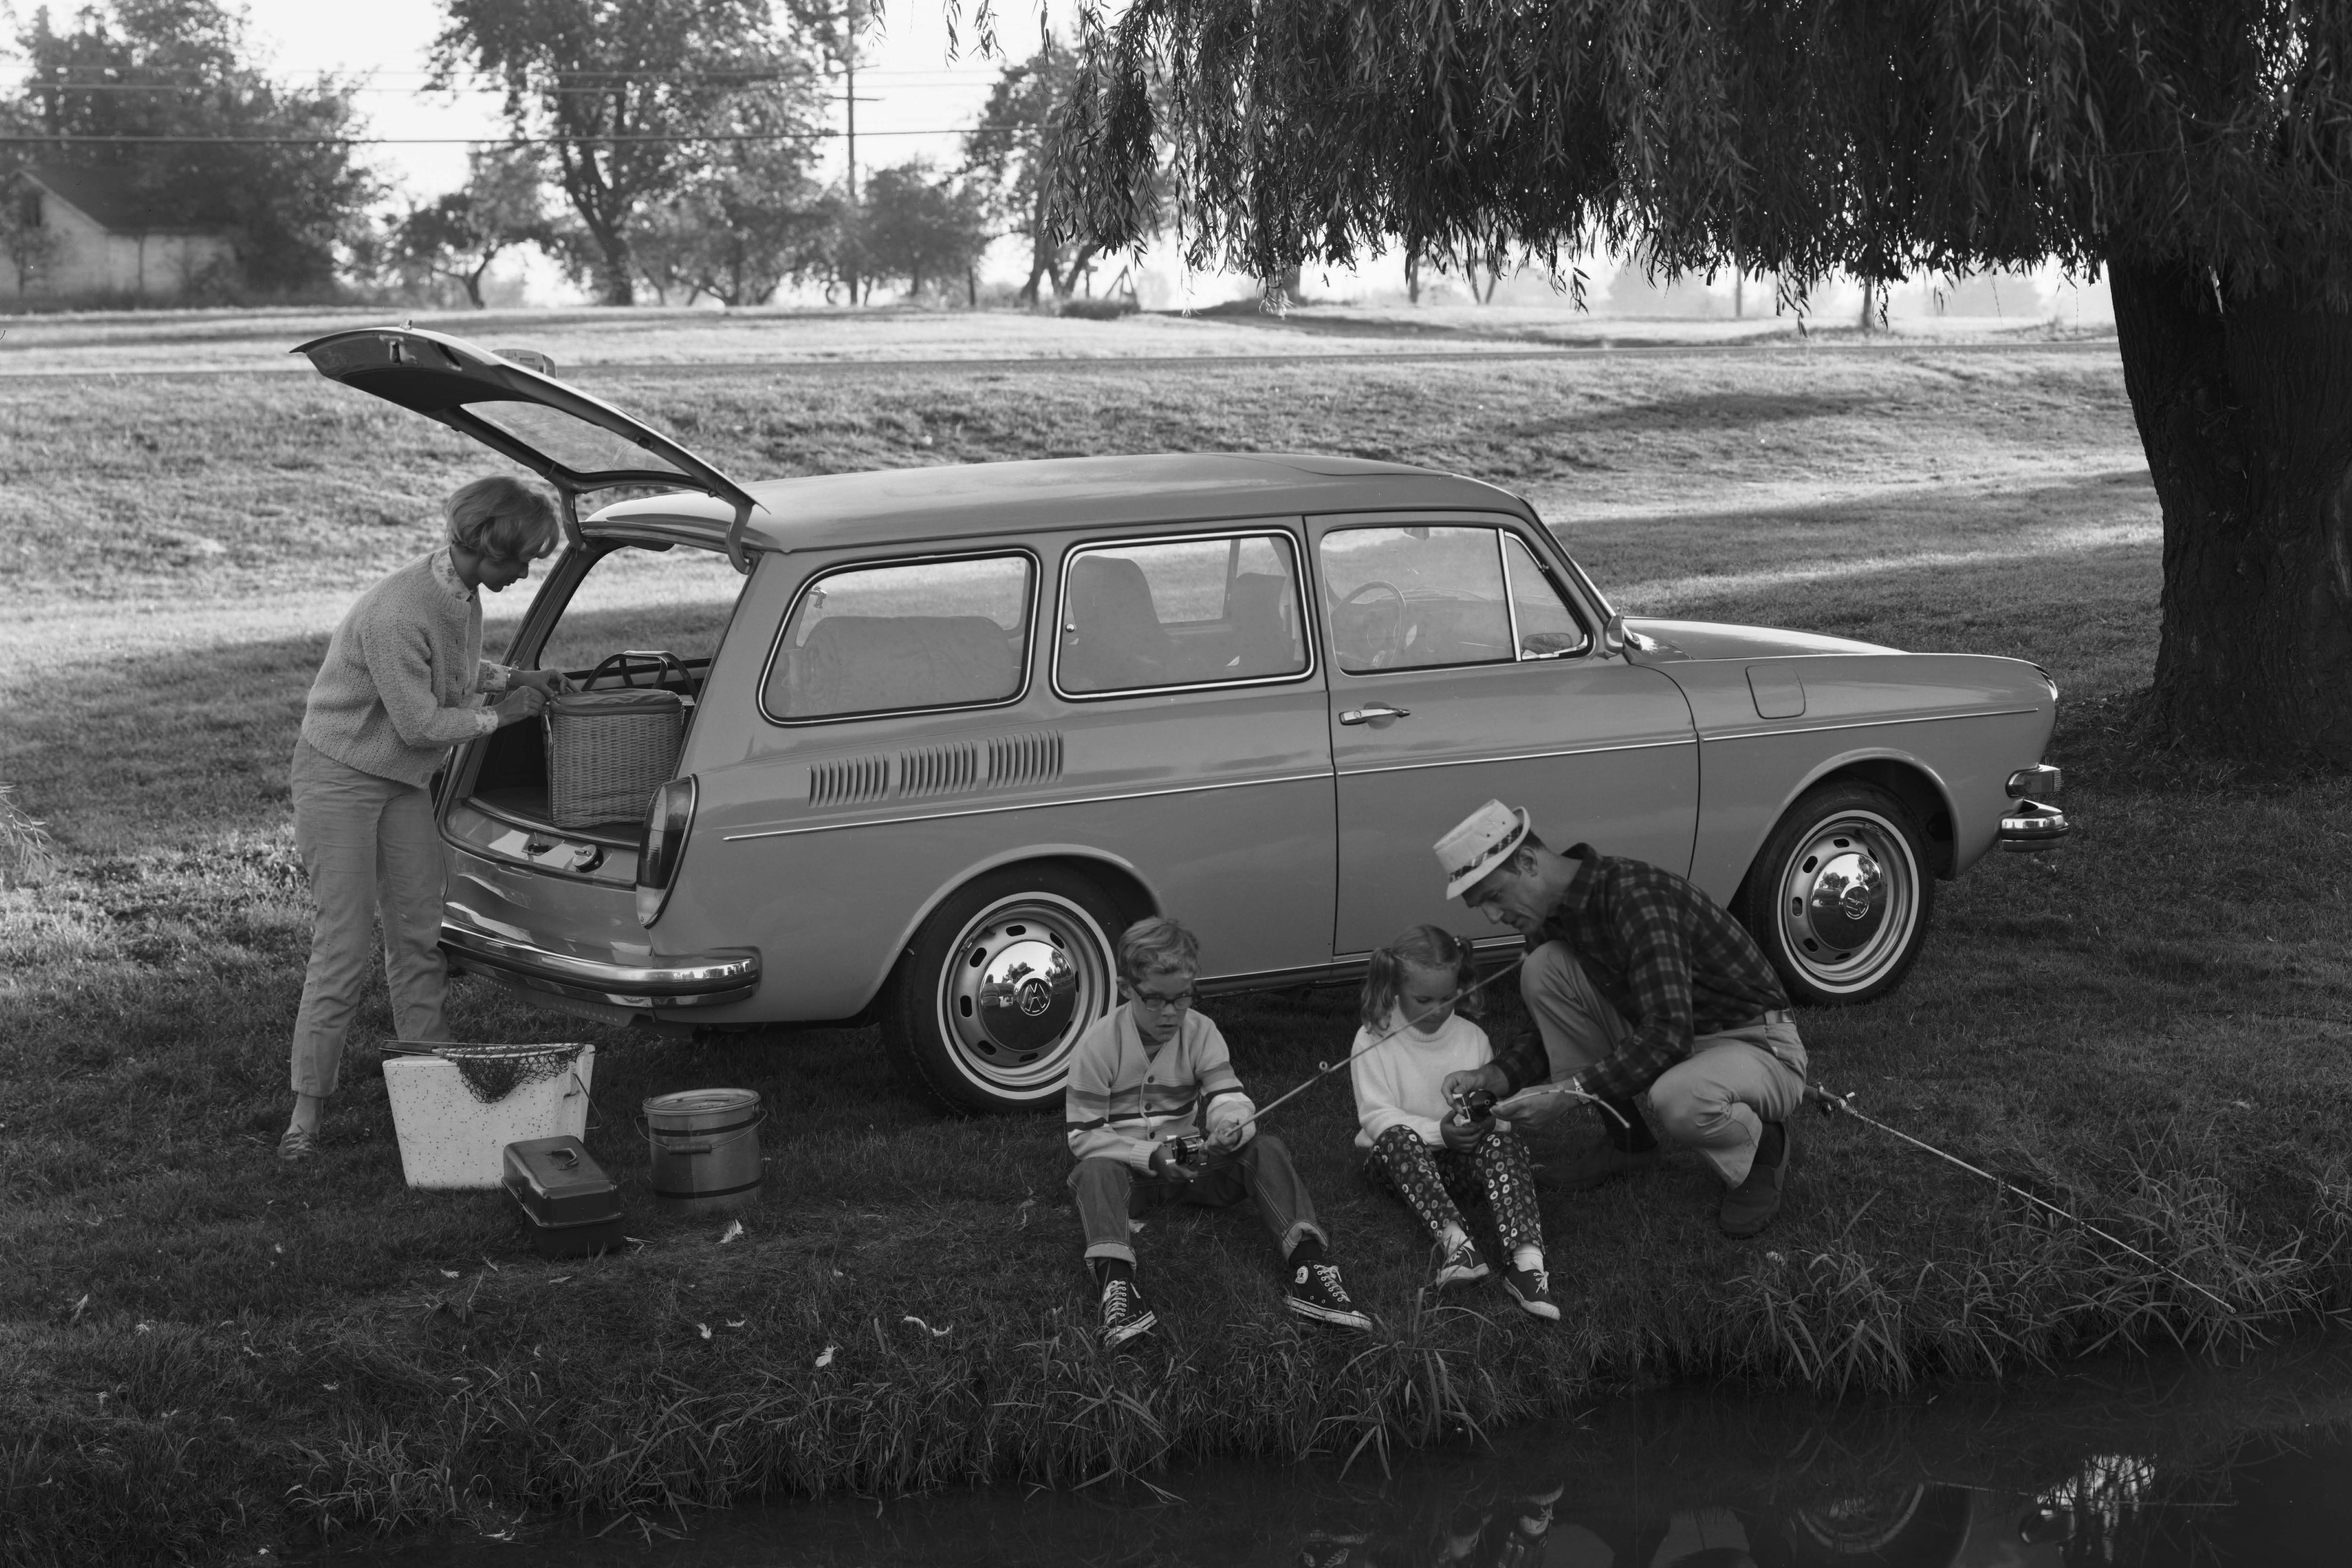 Collectible Classic: 1966-1973 Volkswagen Squareback